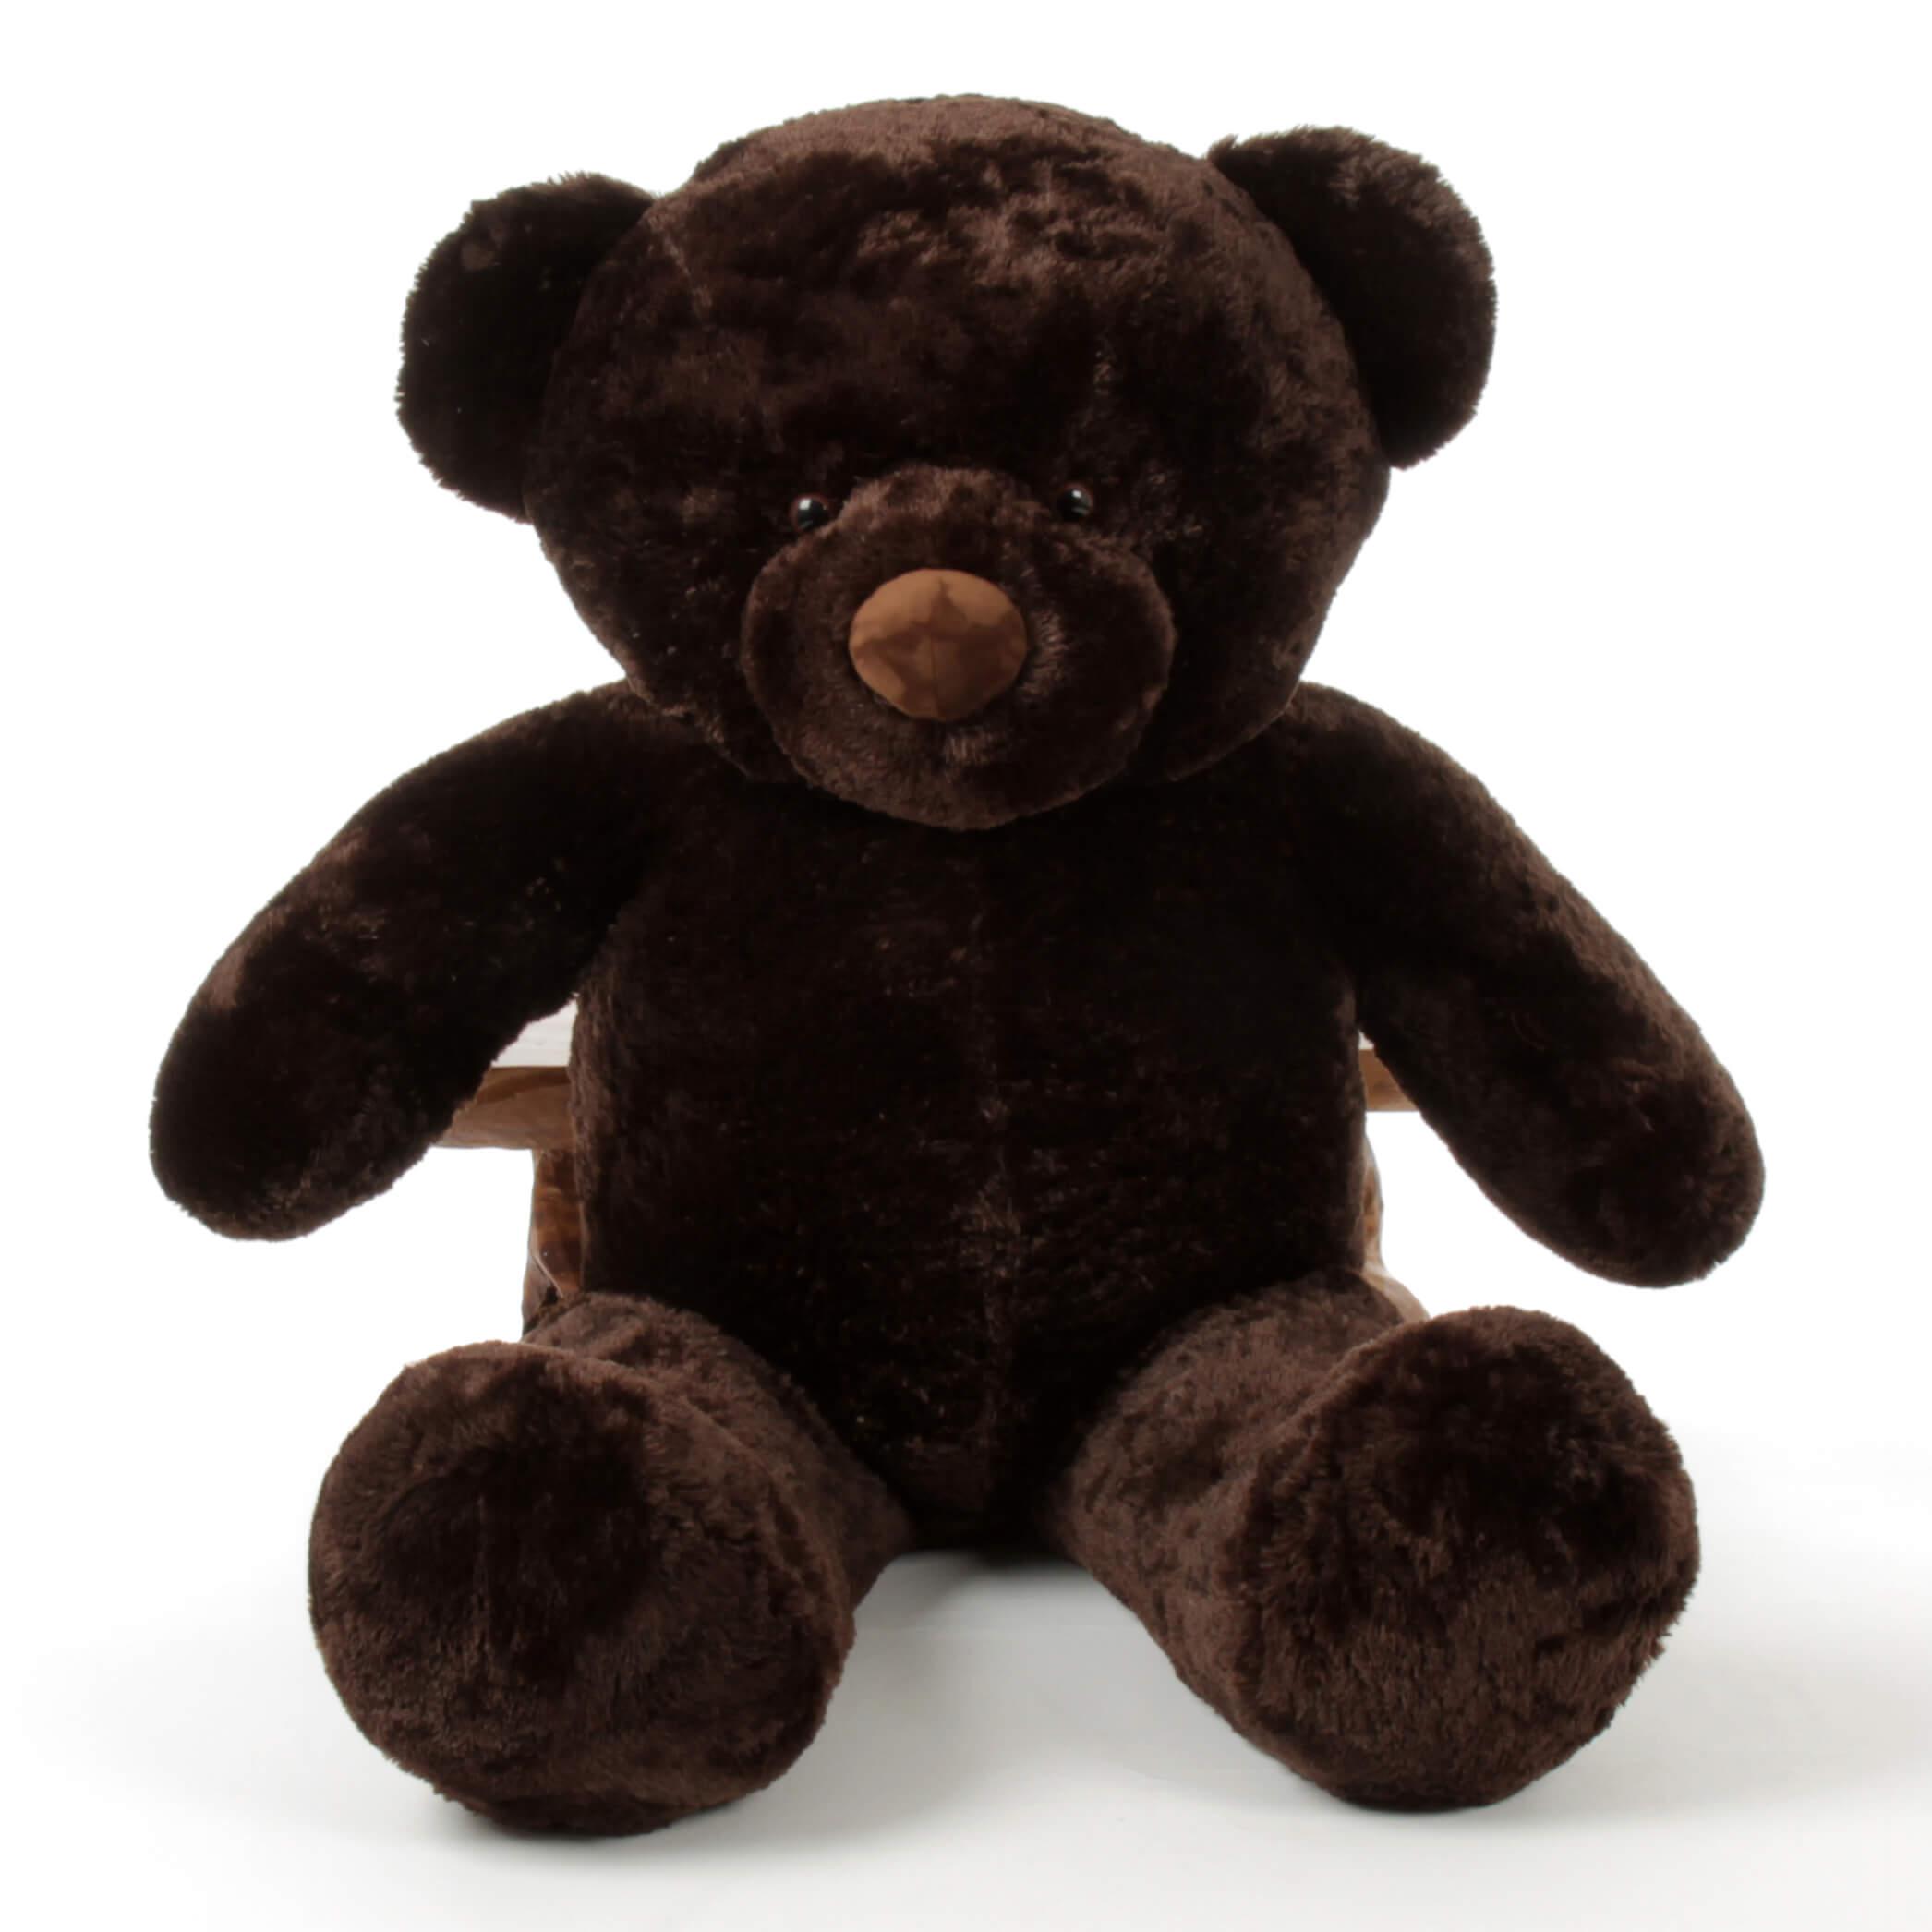 6ft-softest-and-huggable-munchkin-chubs-dark-brown-teddy-bear-1.jpg